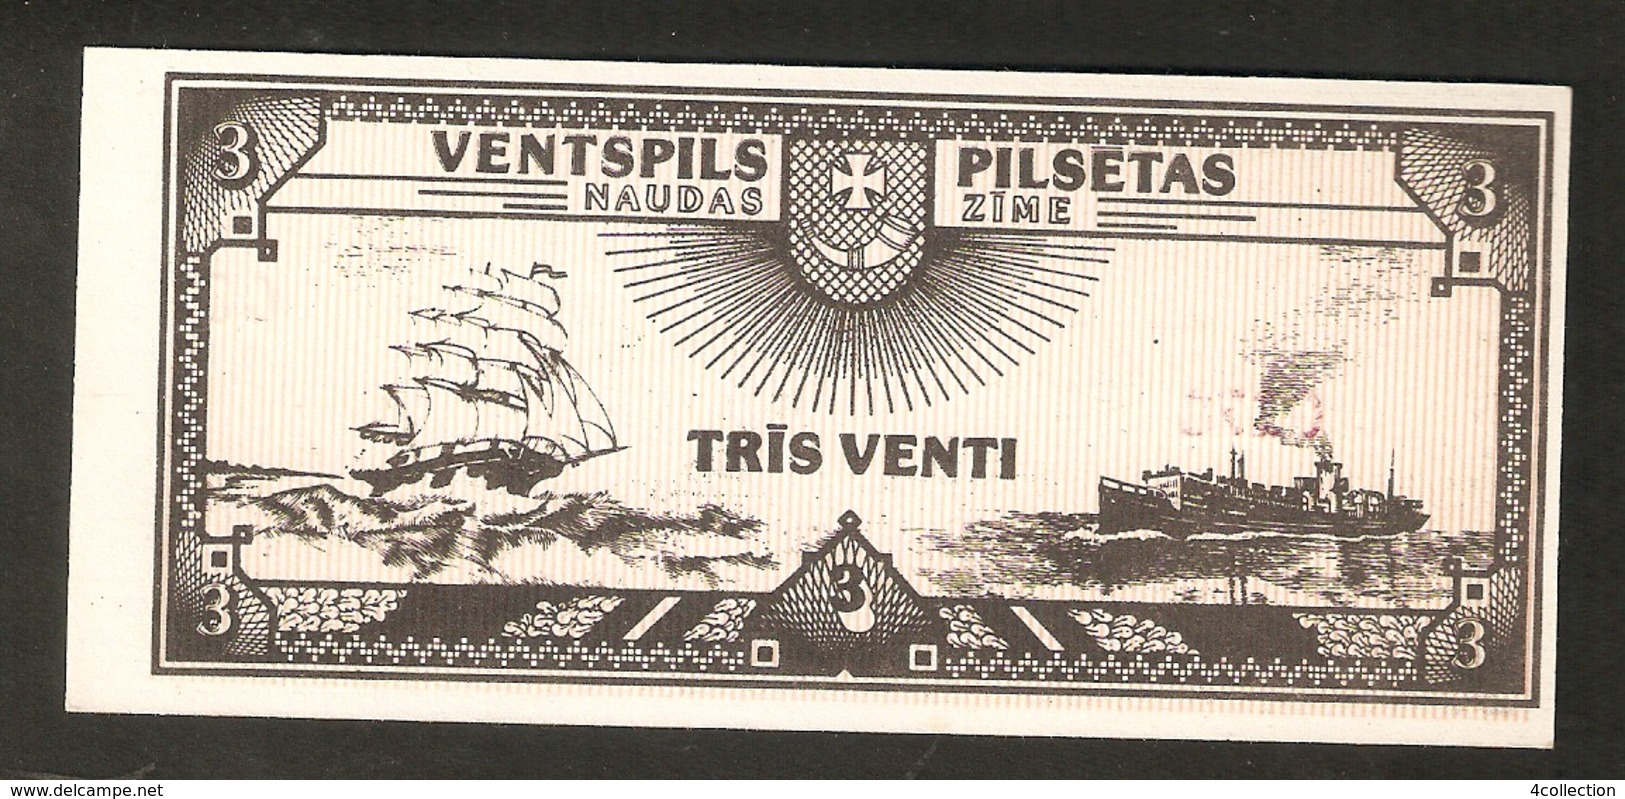 T. Latvia VENTSPILS Naudas Zime 3 VENTI 1990 700th Anniversary Mantu Loterija Lottery Ticket No. 03 - 0278 - Latvia